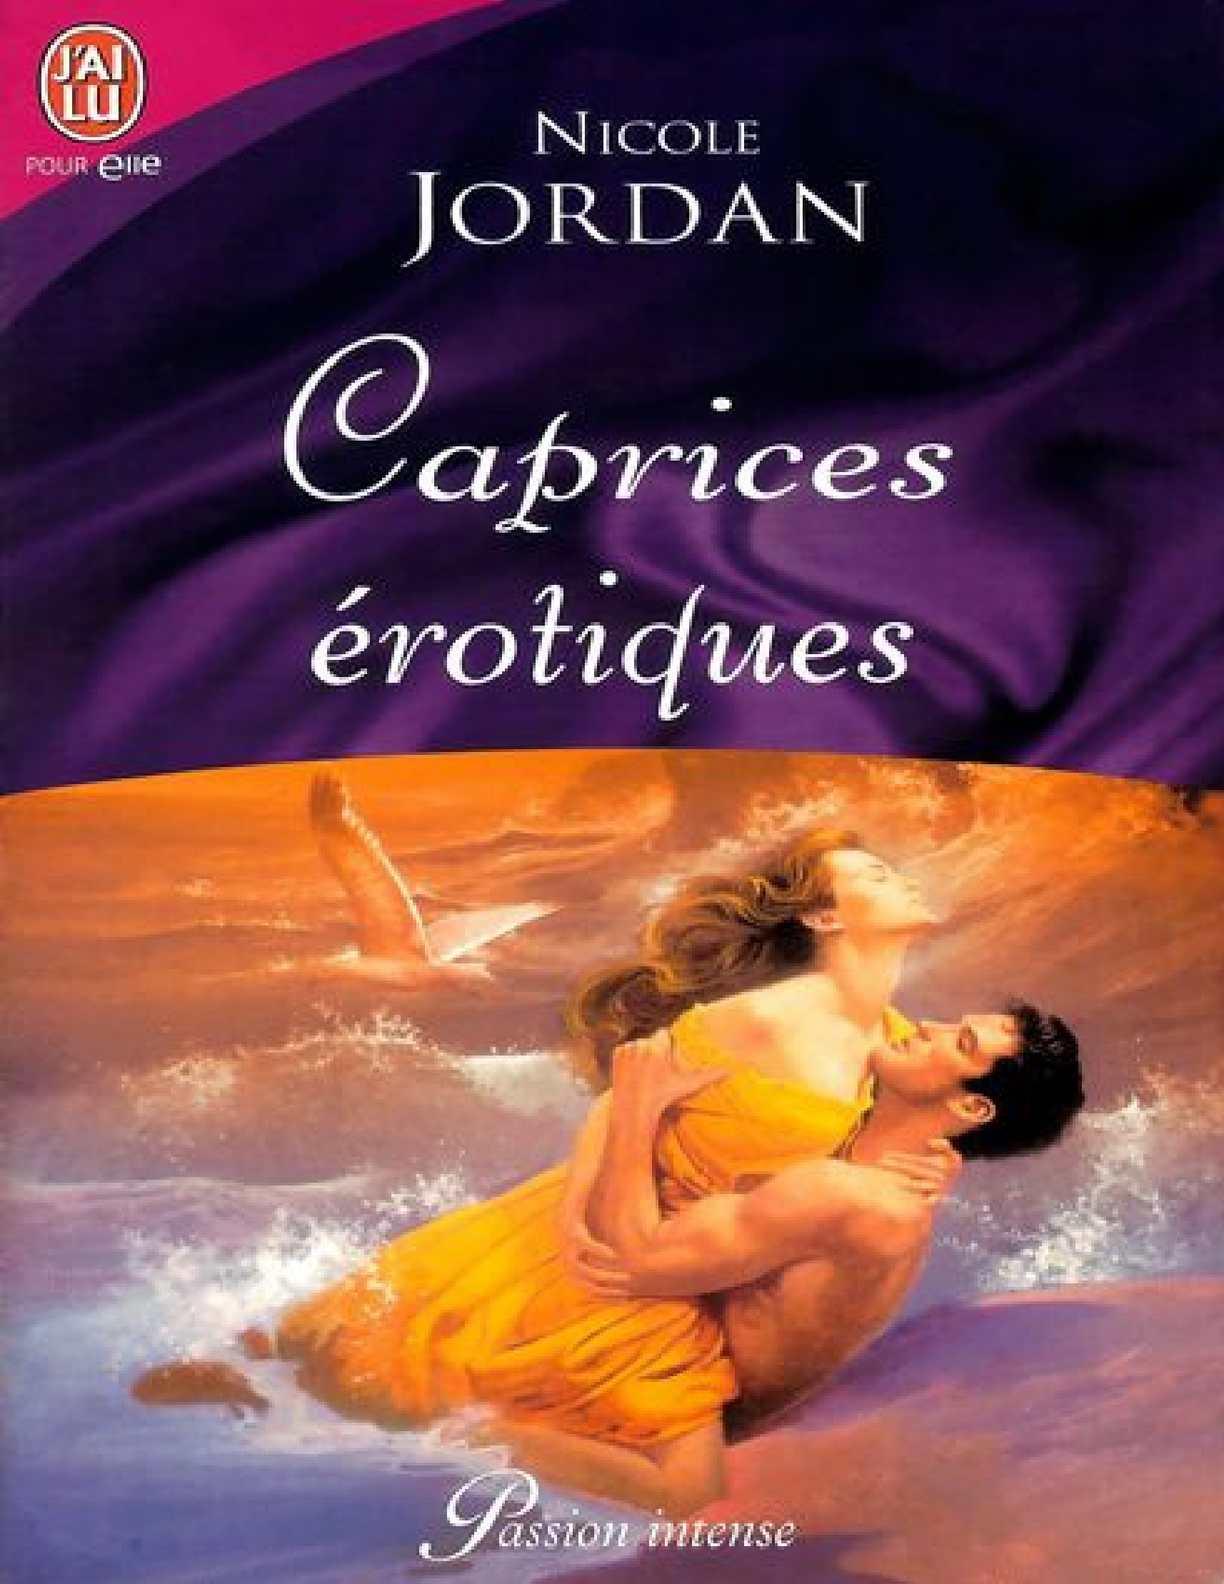 Une Comtesse En Fuite Pdf Ekladata : comtesse, fuite, ekladata, Calaméo, Caprices, érotiques, Nicole, Jordan